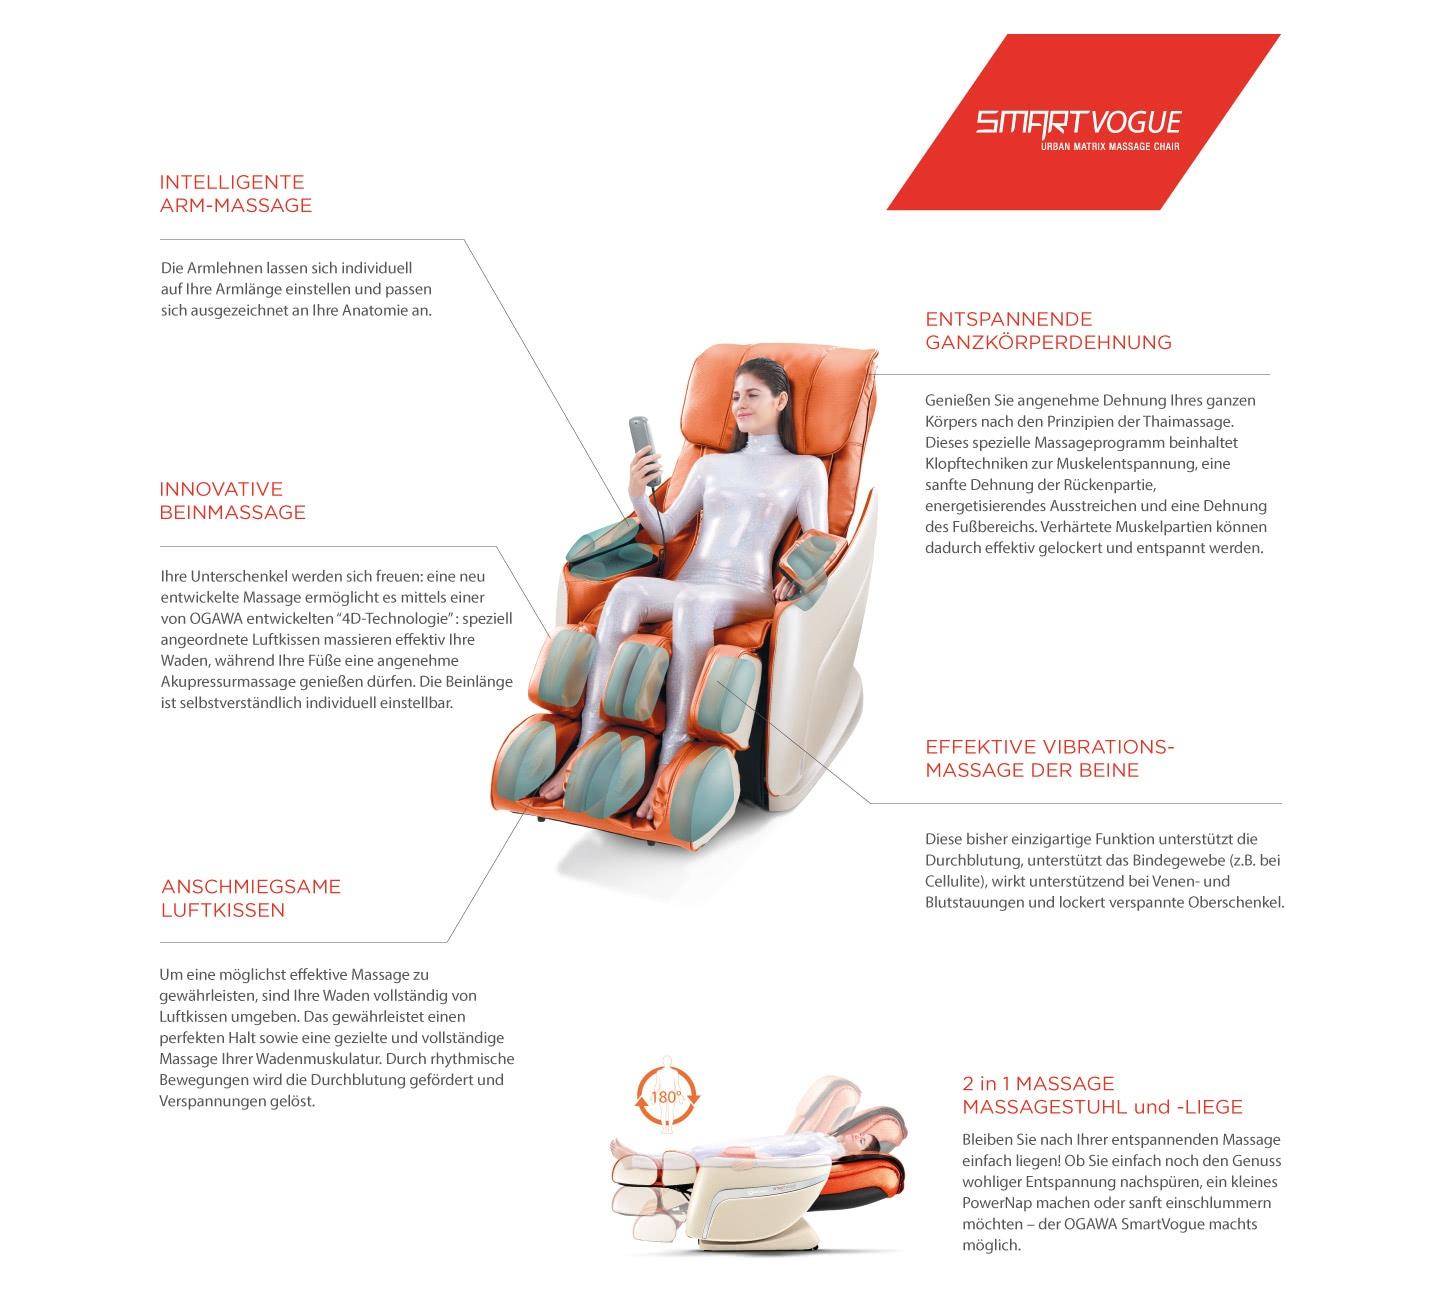 SmartVogue-Features-produktuebersicht-1